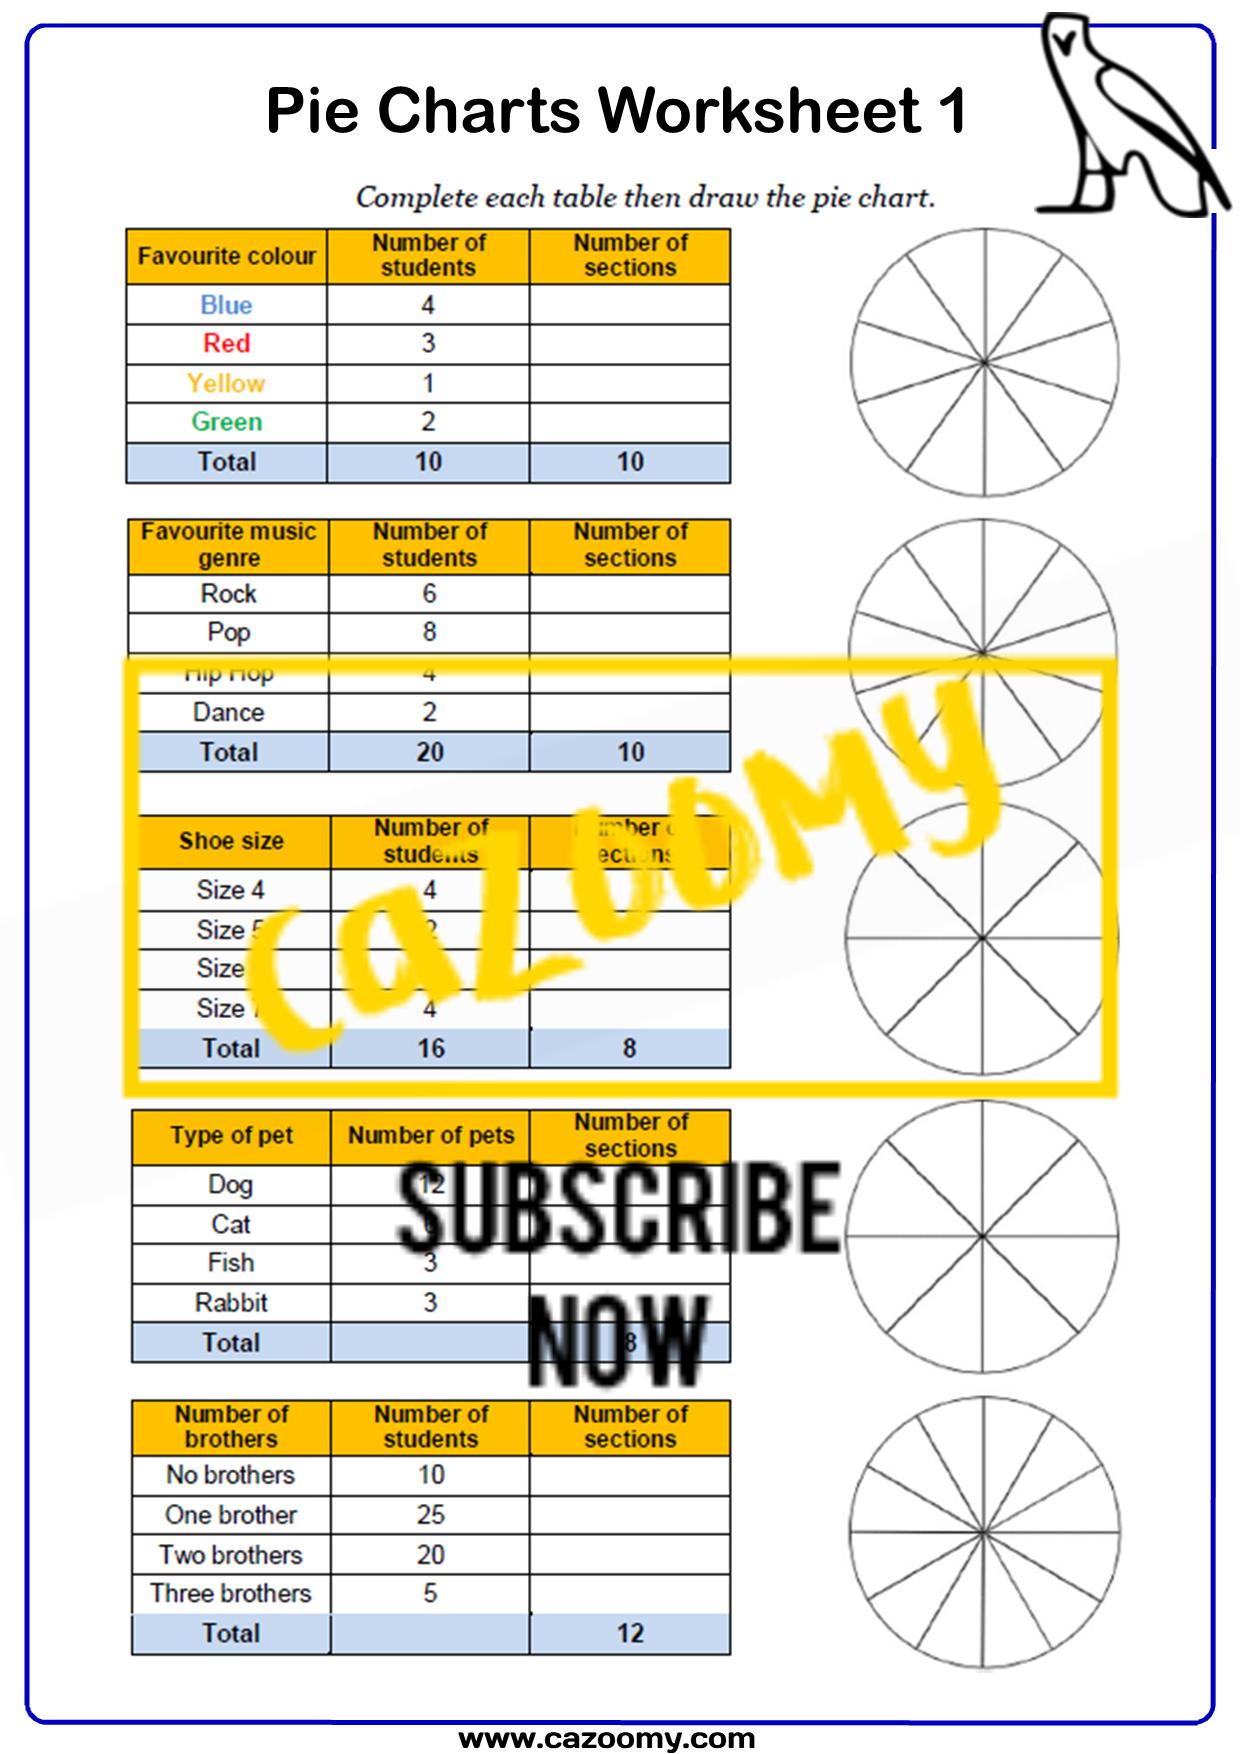 Pie Charts Worksheet 1